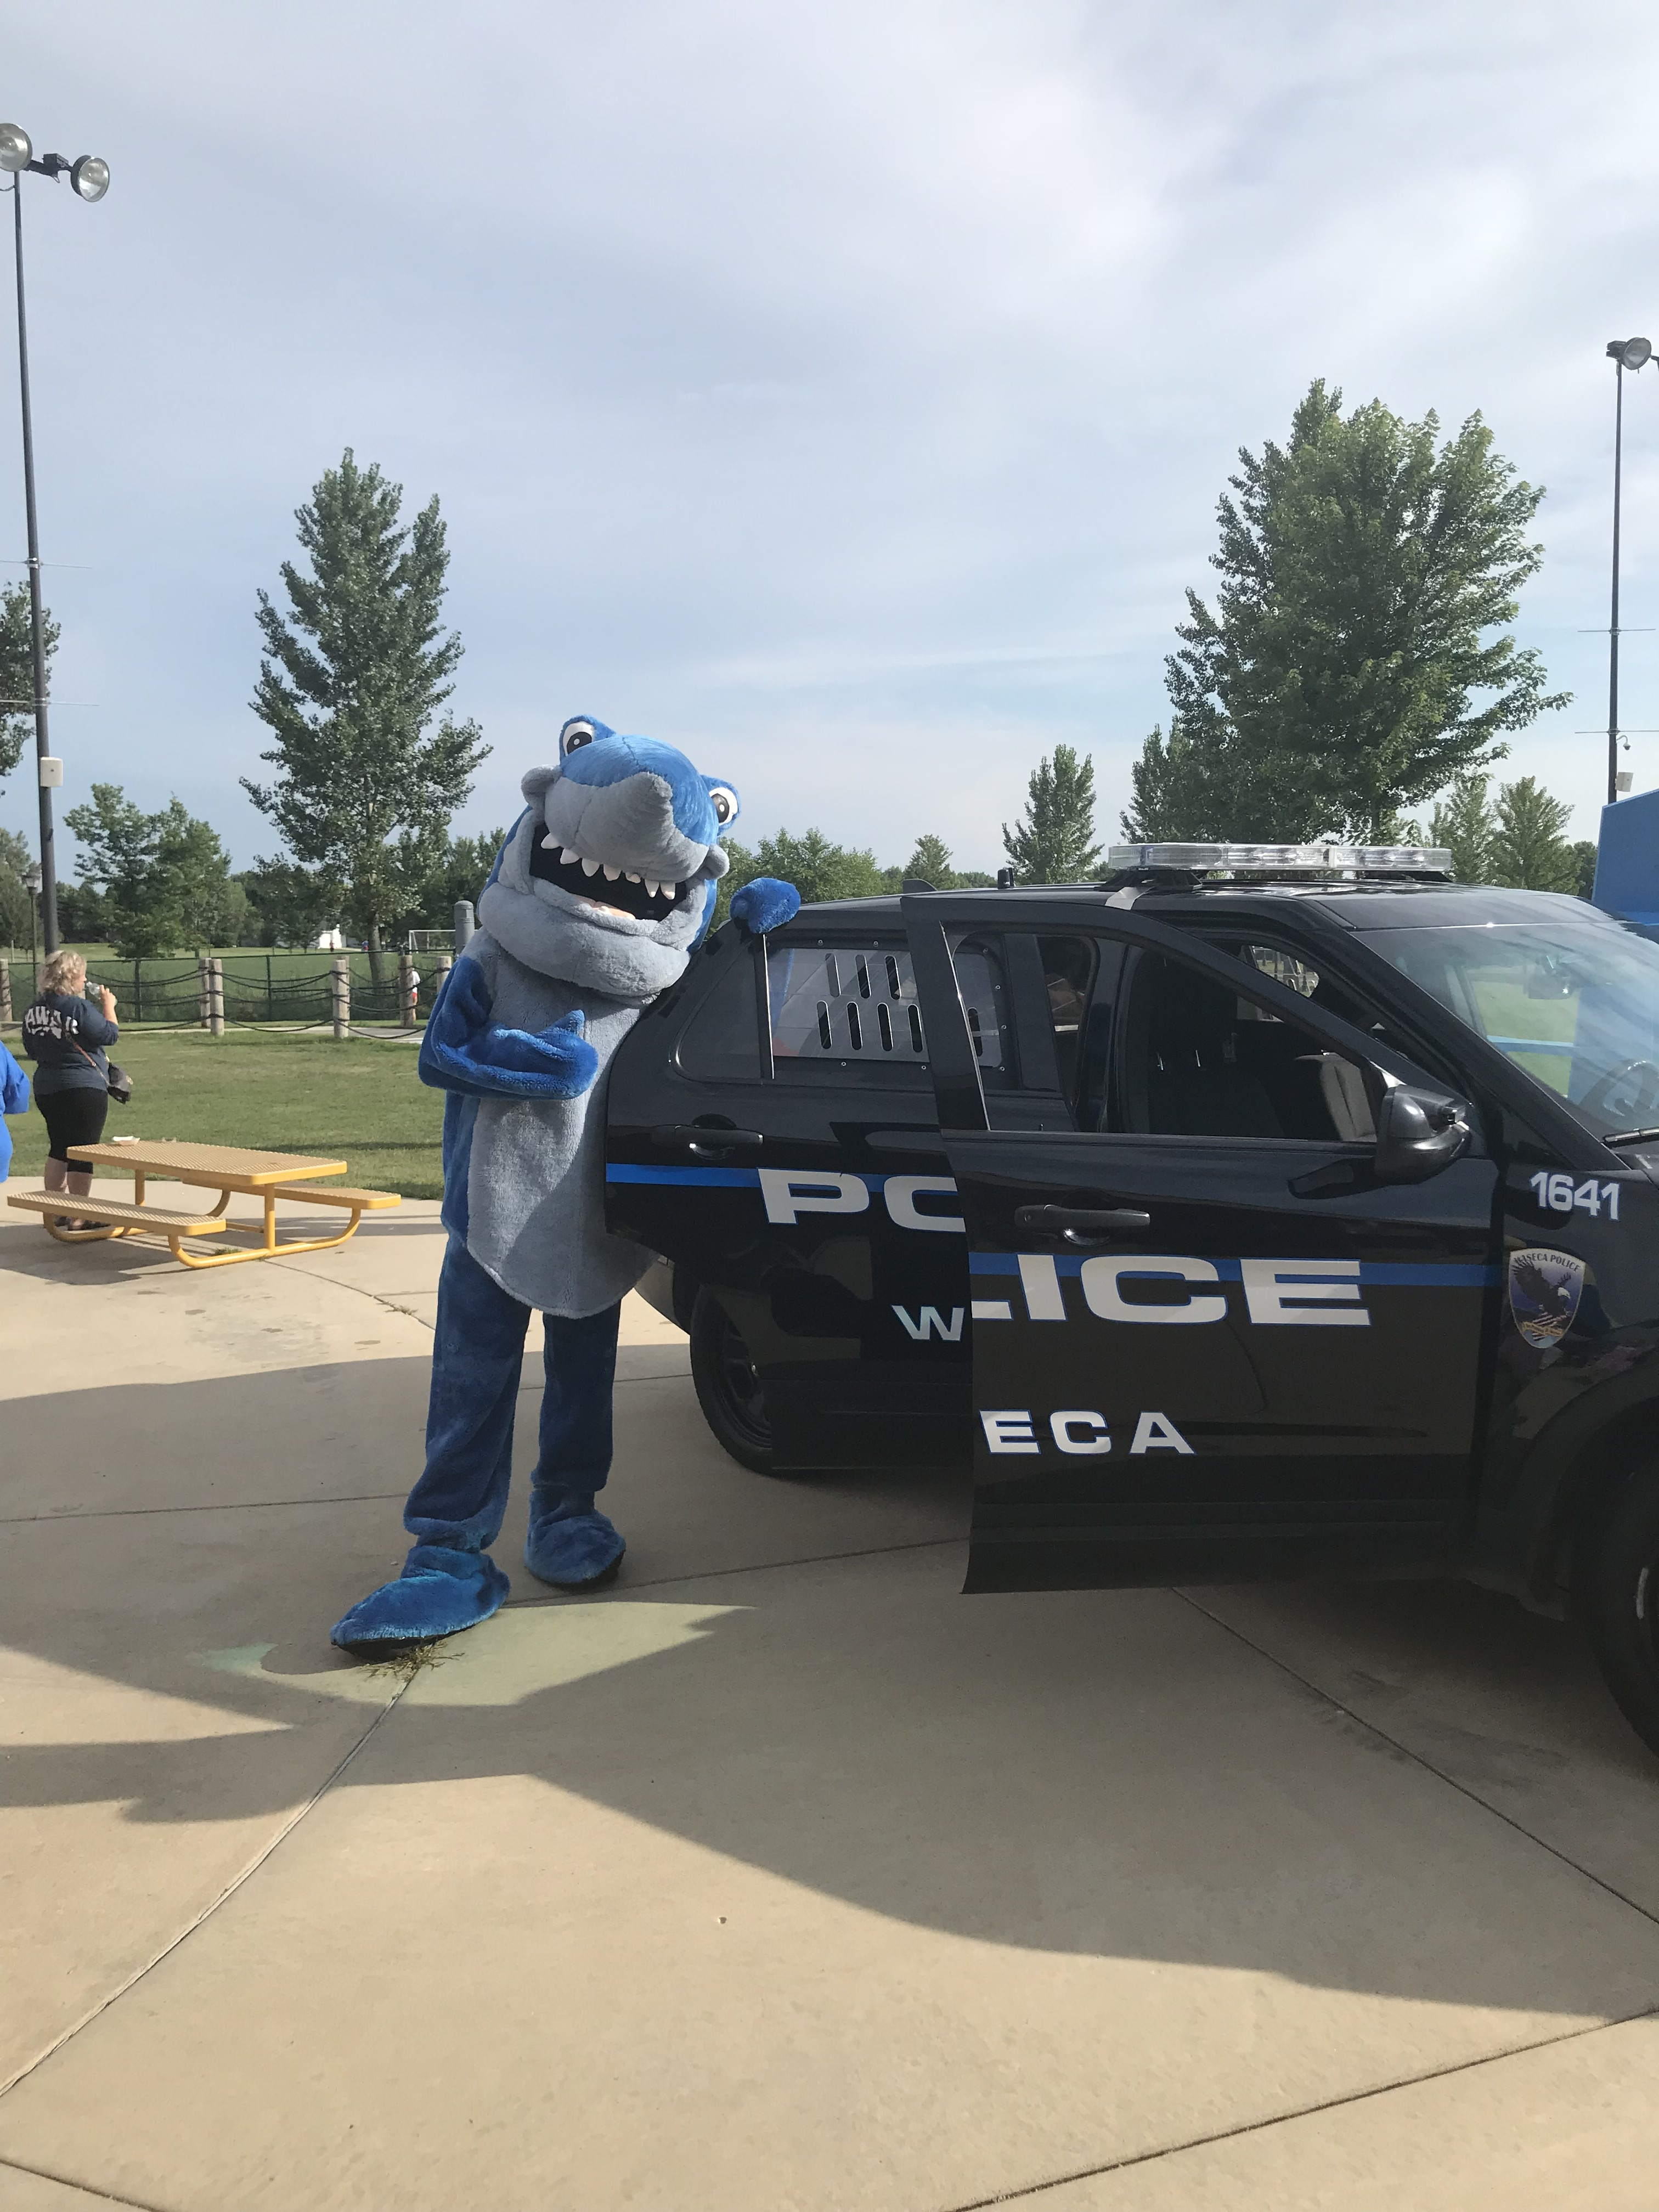 Waseca PD Car and Shark Mascot